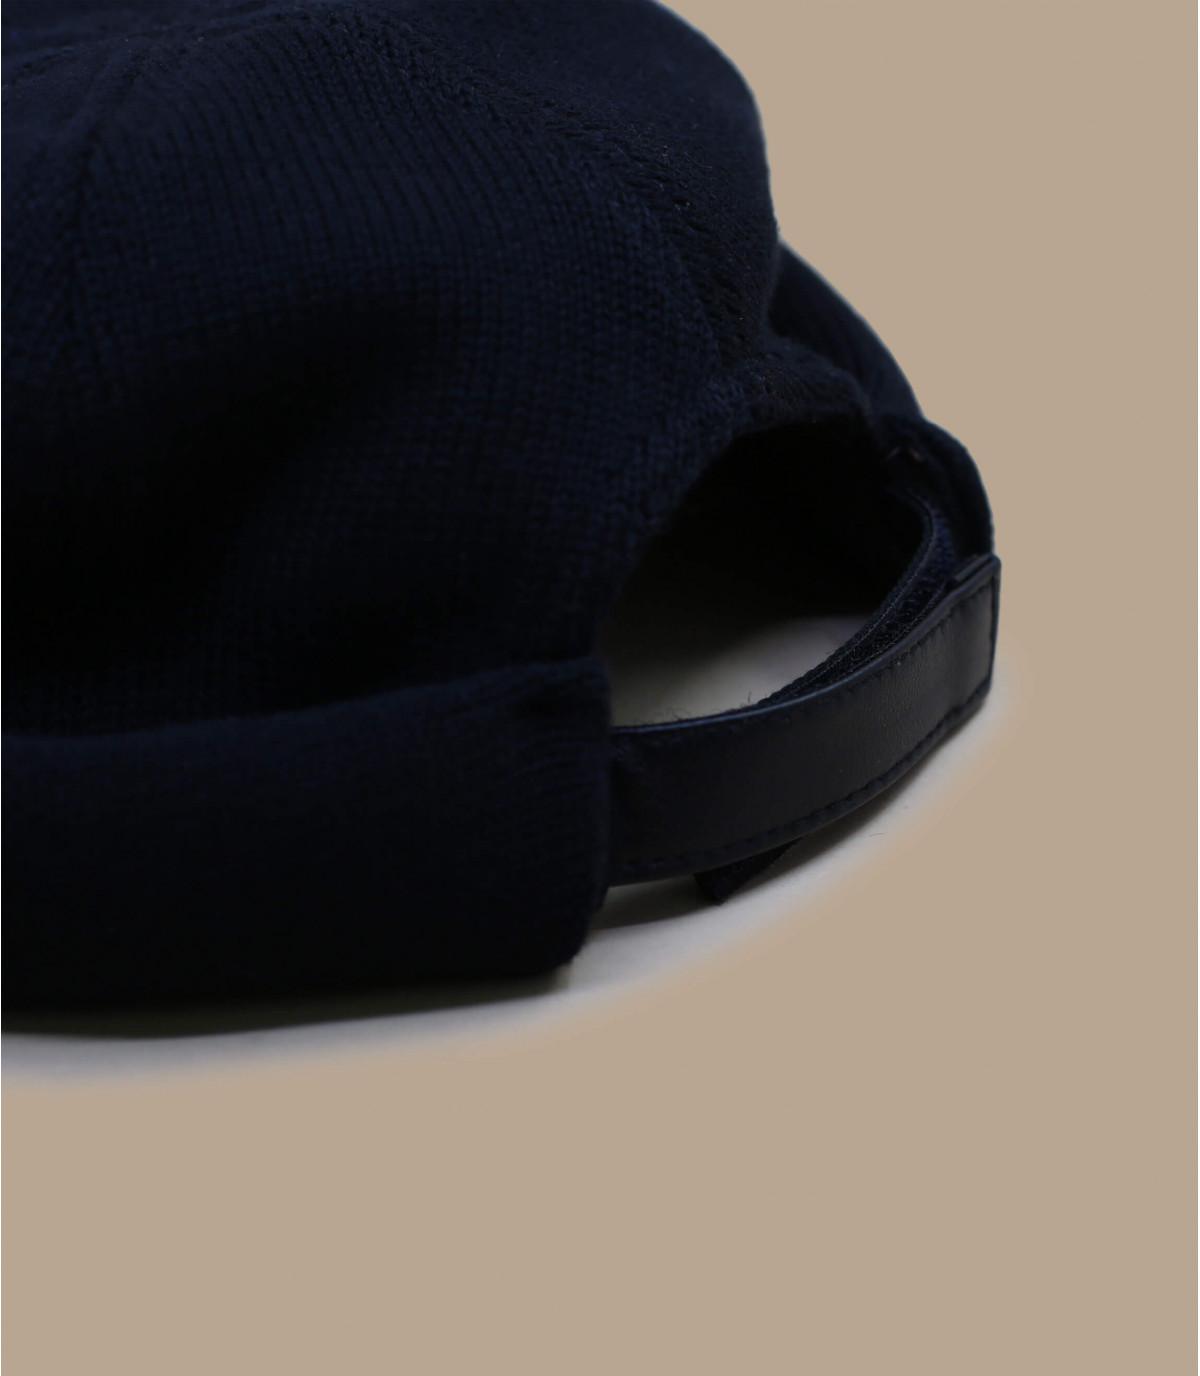 Detalles Docker Cotton Knit black imagen 2